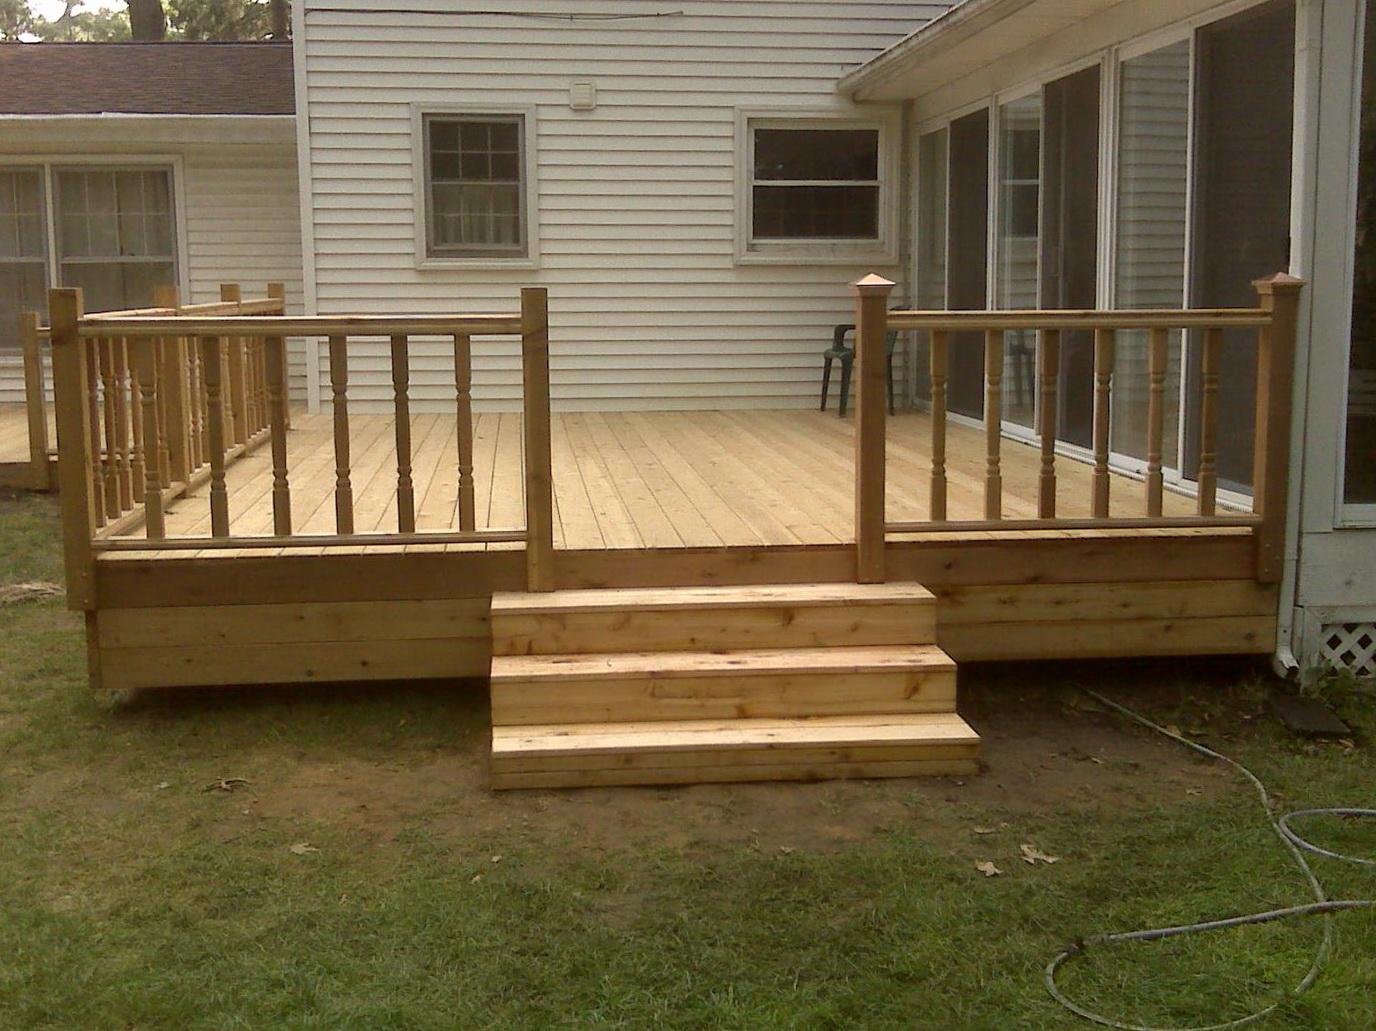 Basic Deck Plans Free | Home Design Ideas on Basic Patio Designs id=15422